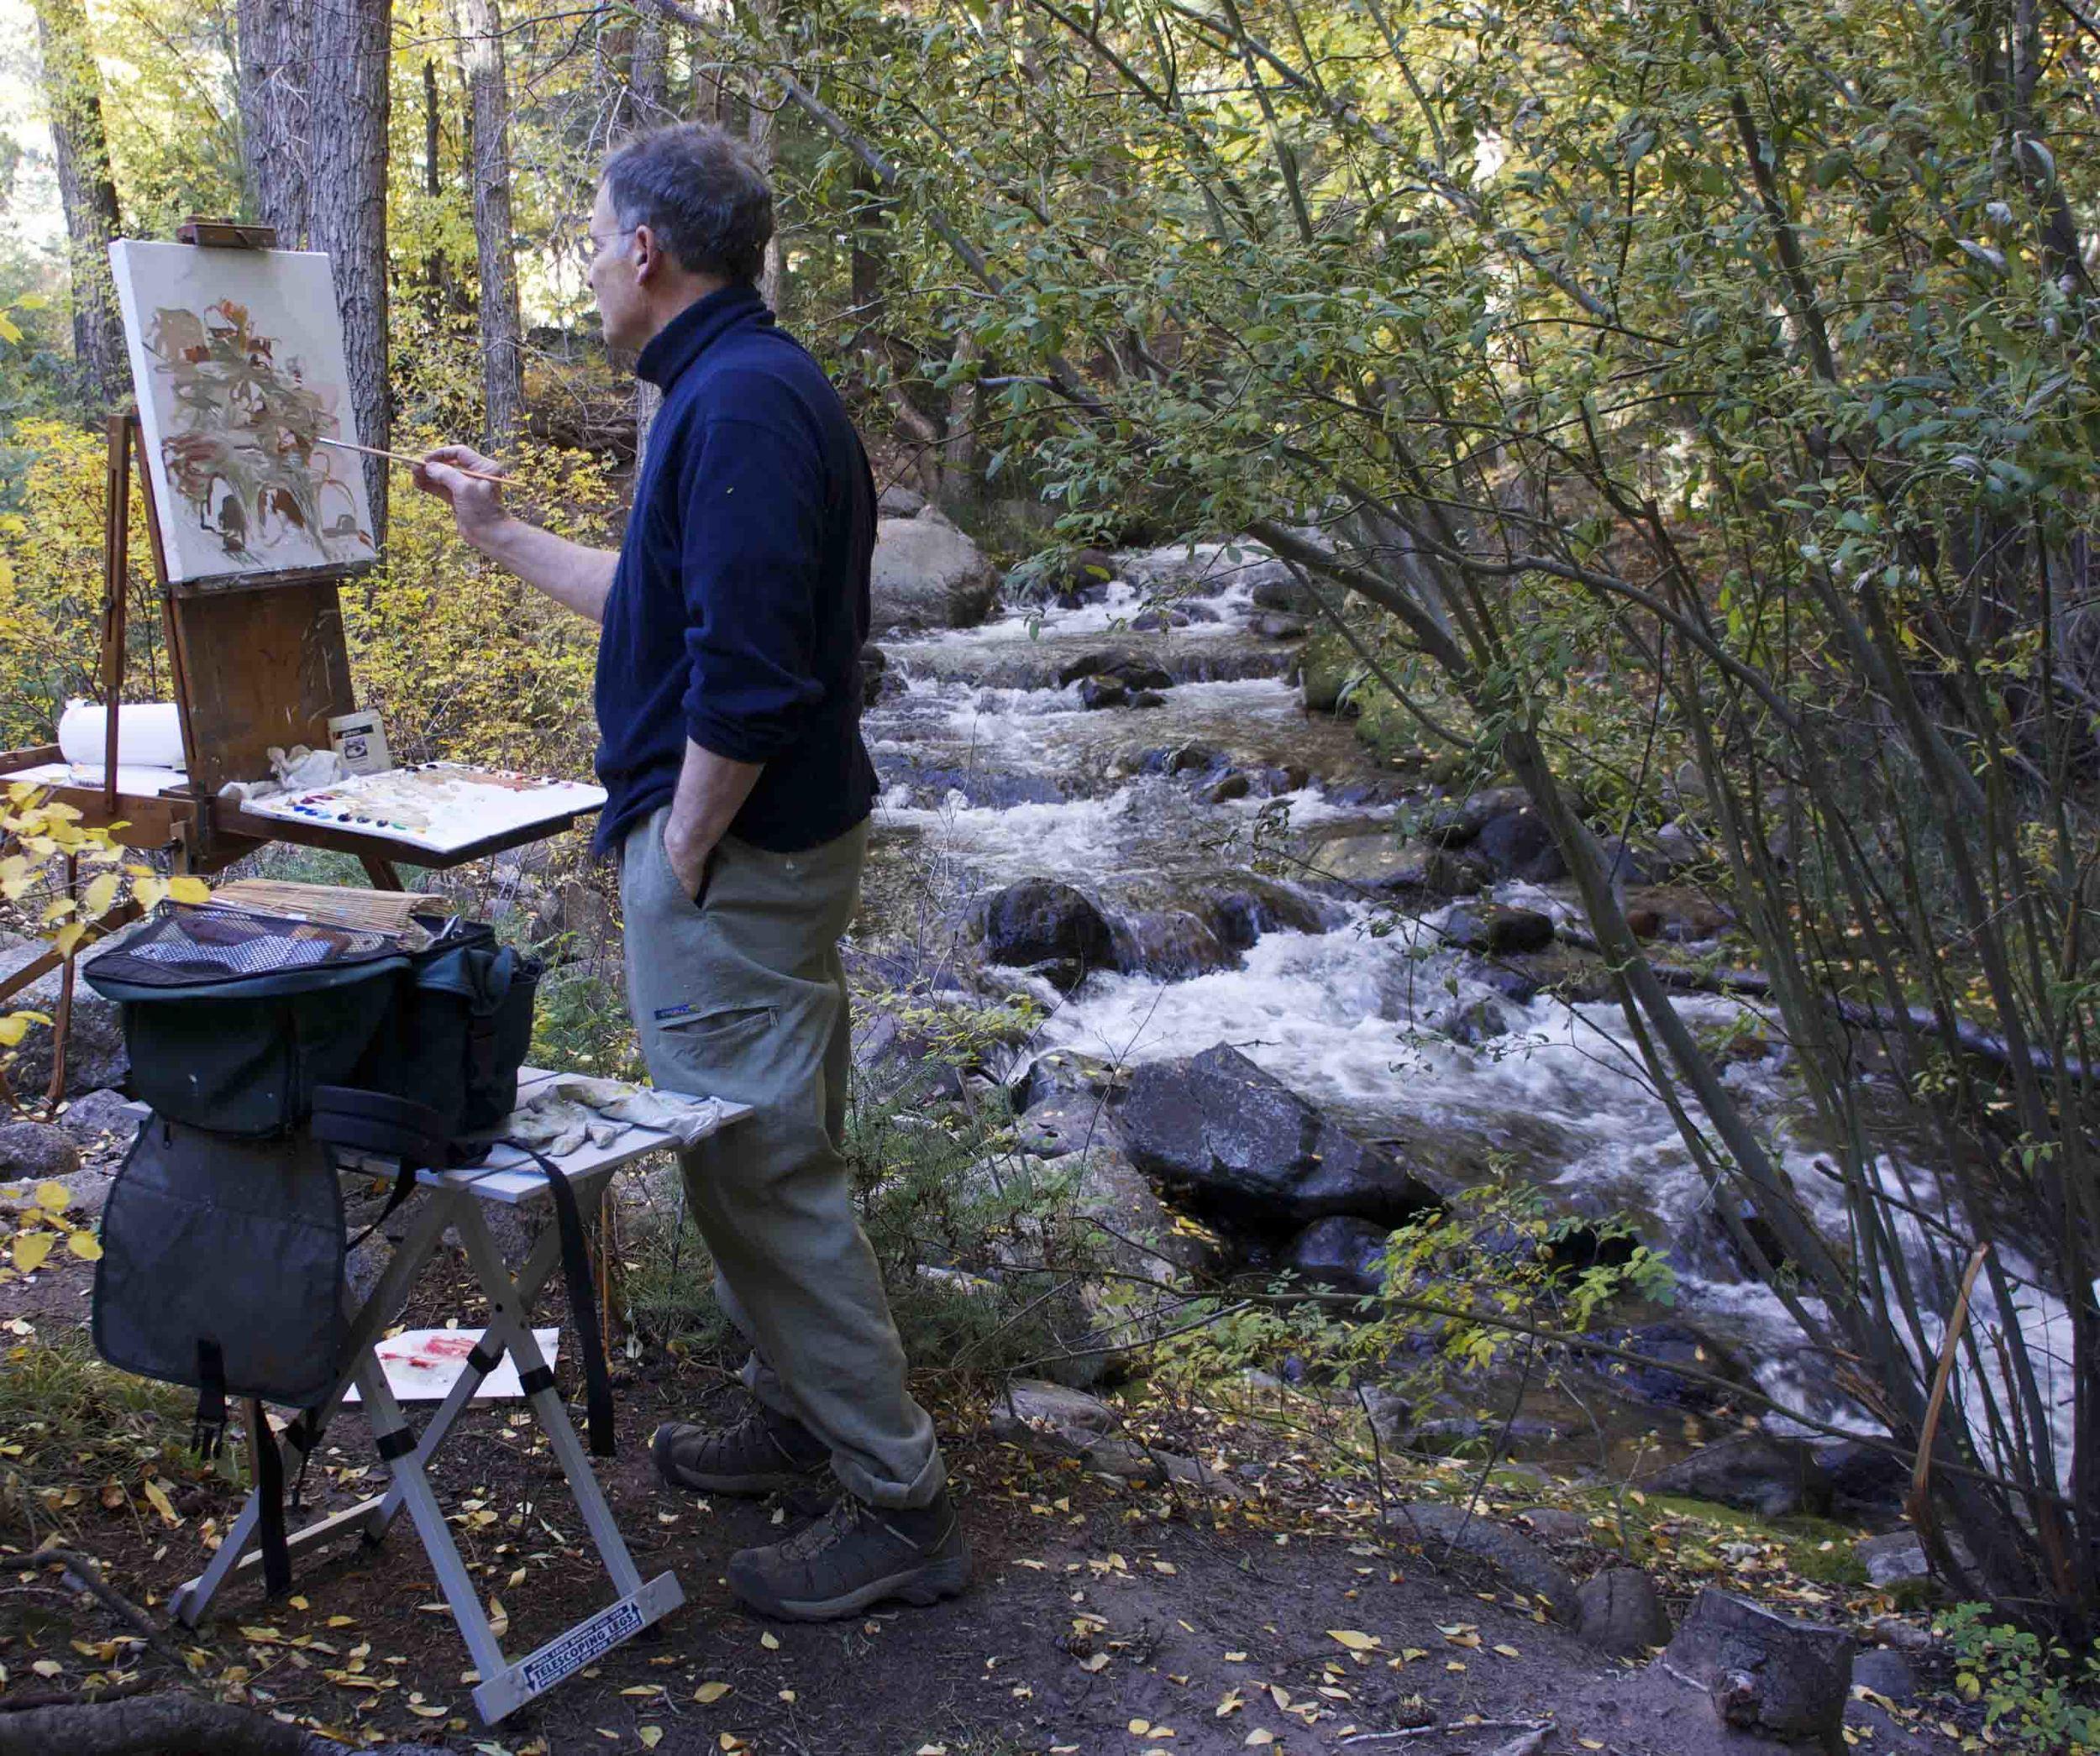 site-10.8.13 RAW-PT paints-n. crestone creek 16x16.jpg